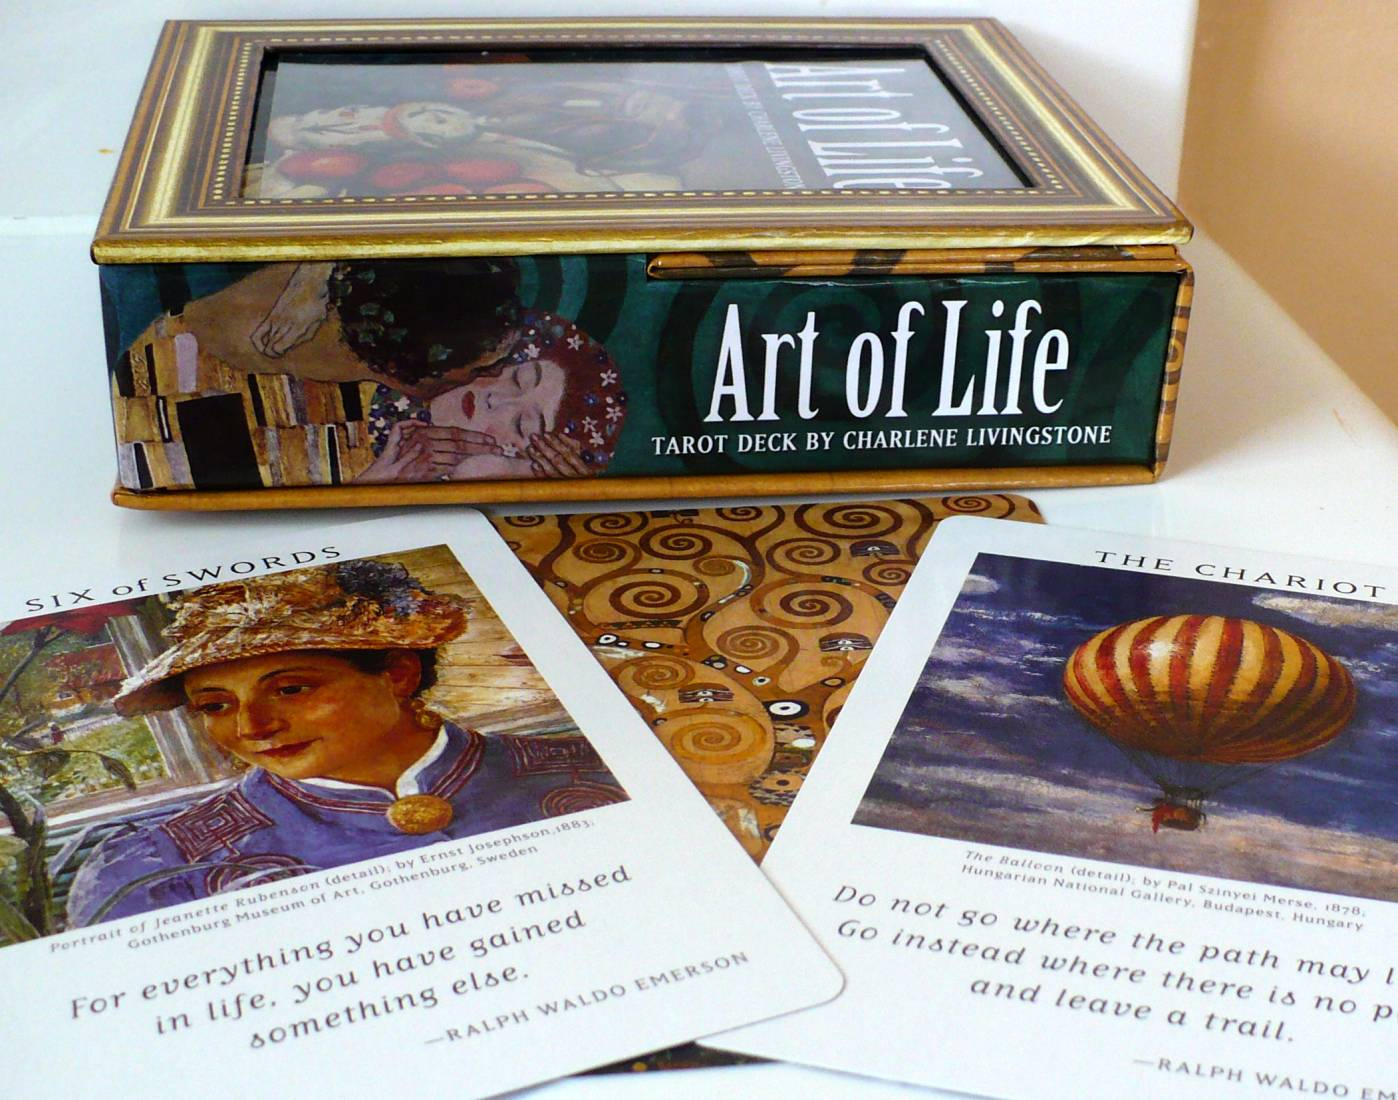 Arto of life 6